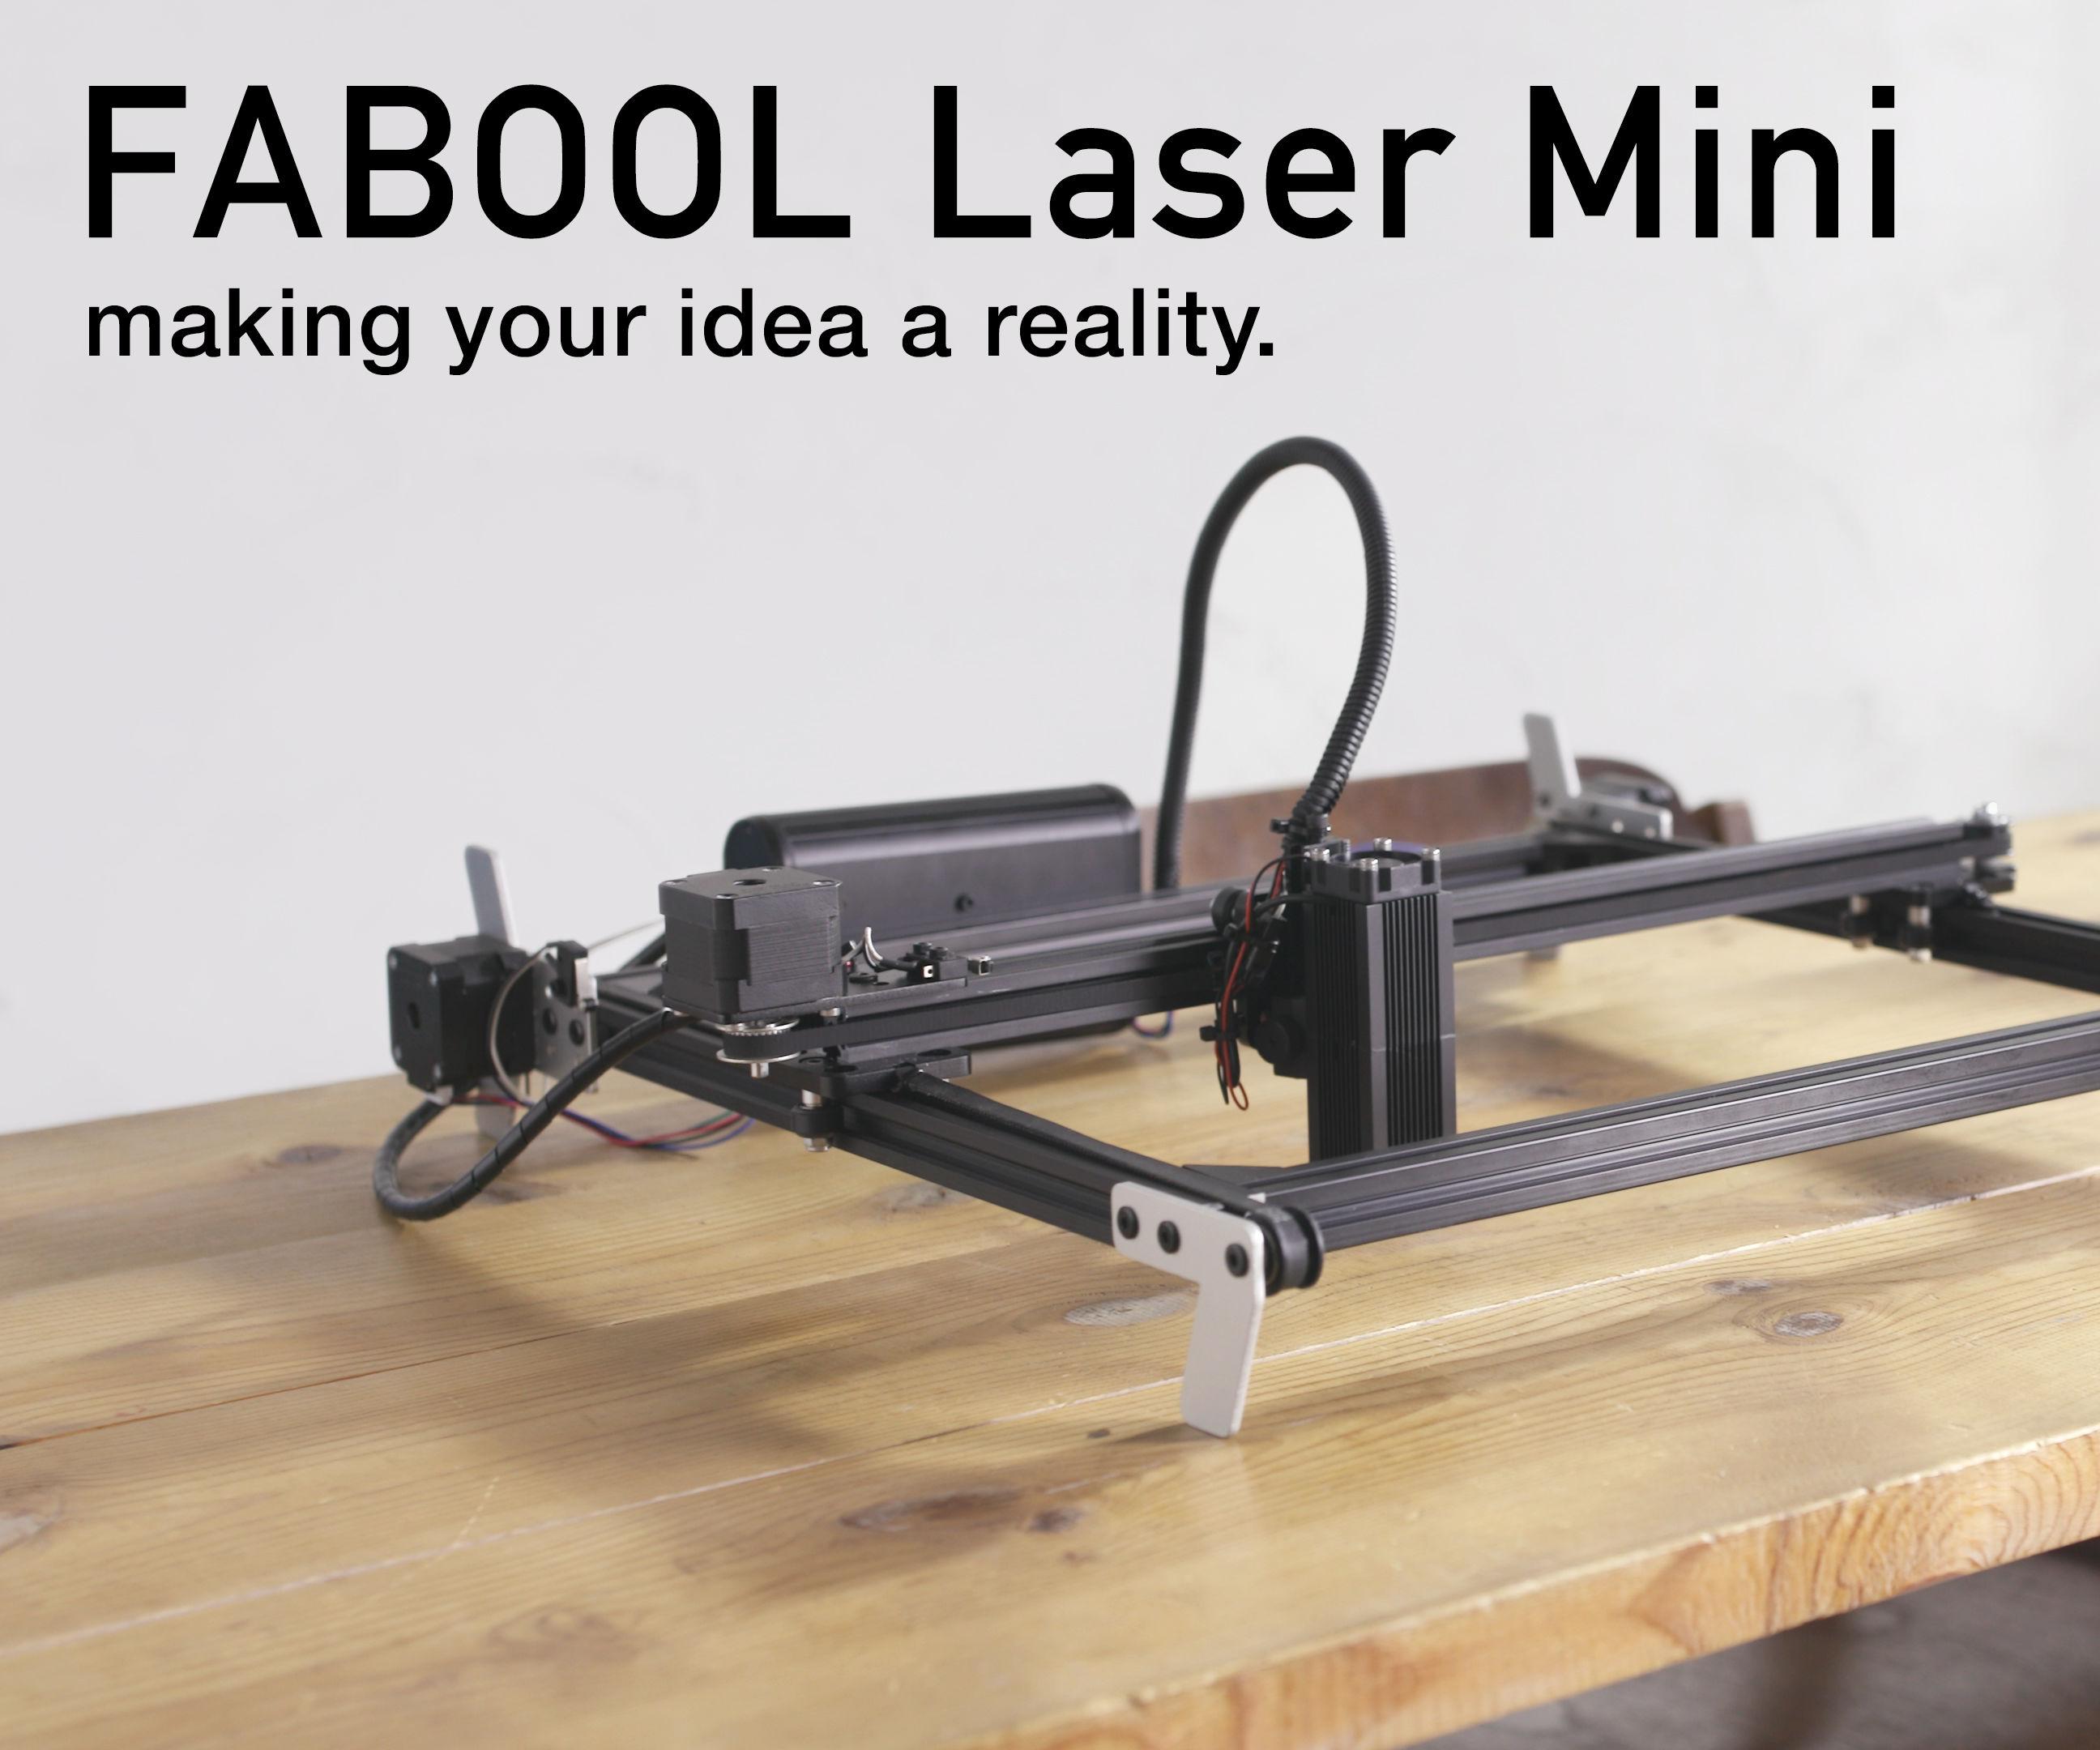 DIY Desktop Laser Cutter and Engraver - FABOOL Laser Mini